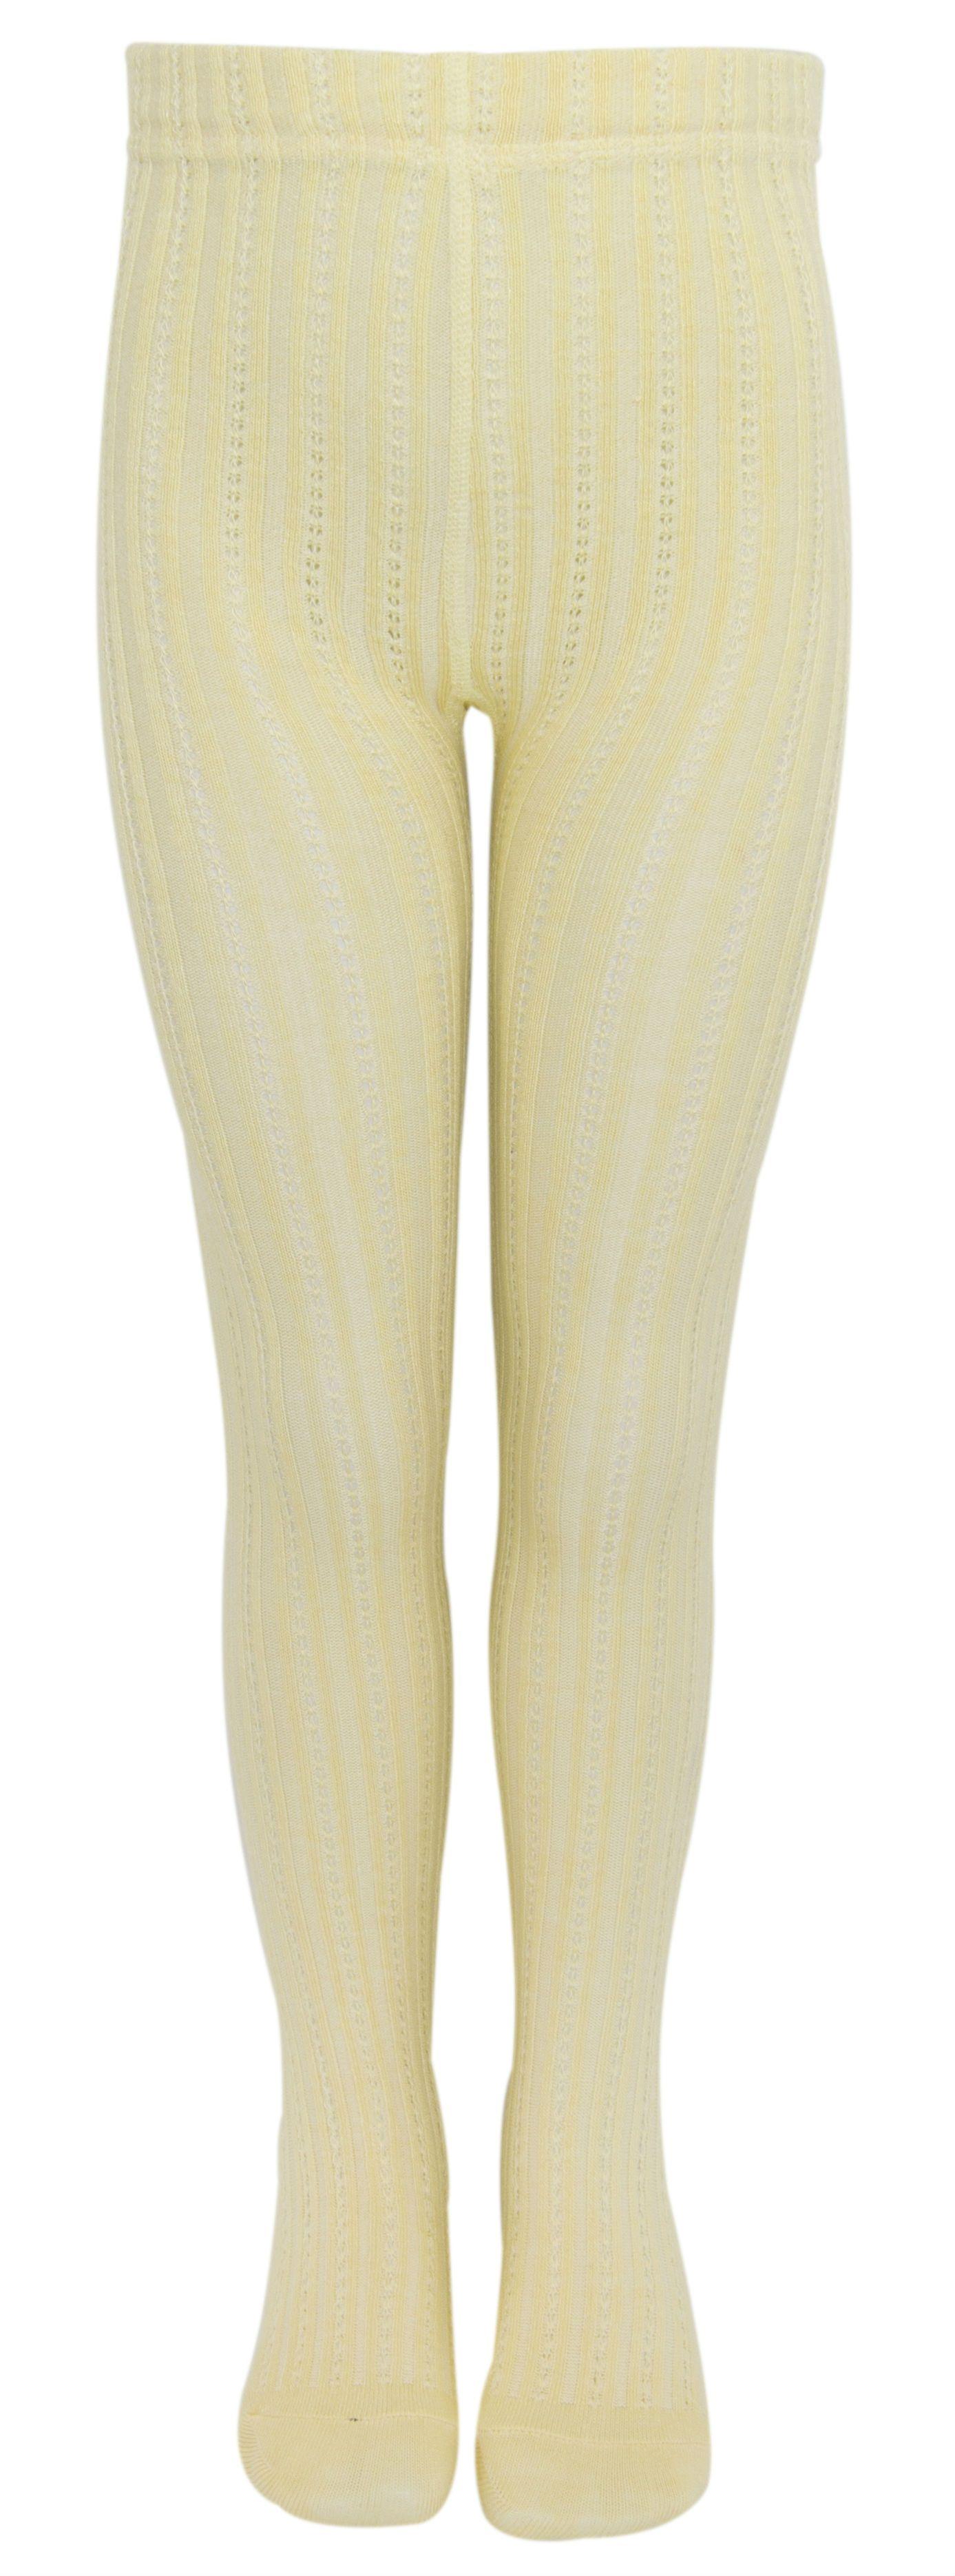 Image of Bambus strømpebukser fra Melton - Creamy Yellow (920010-601)